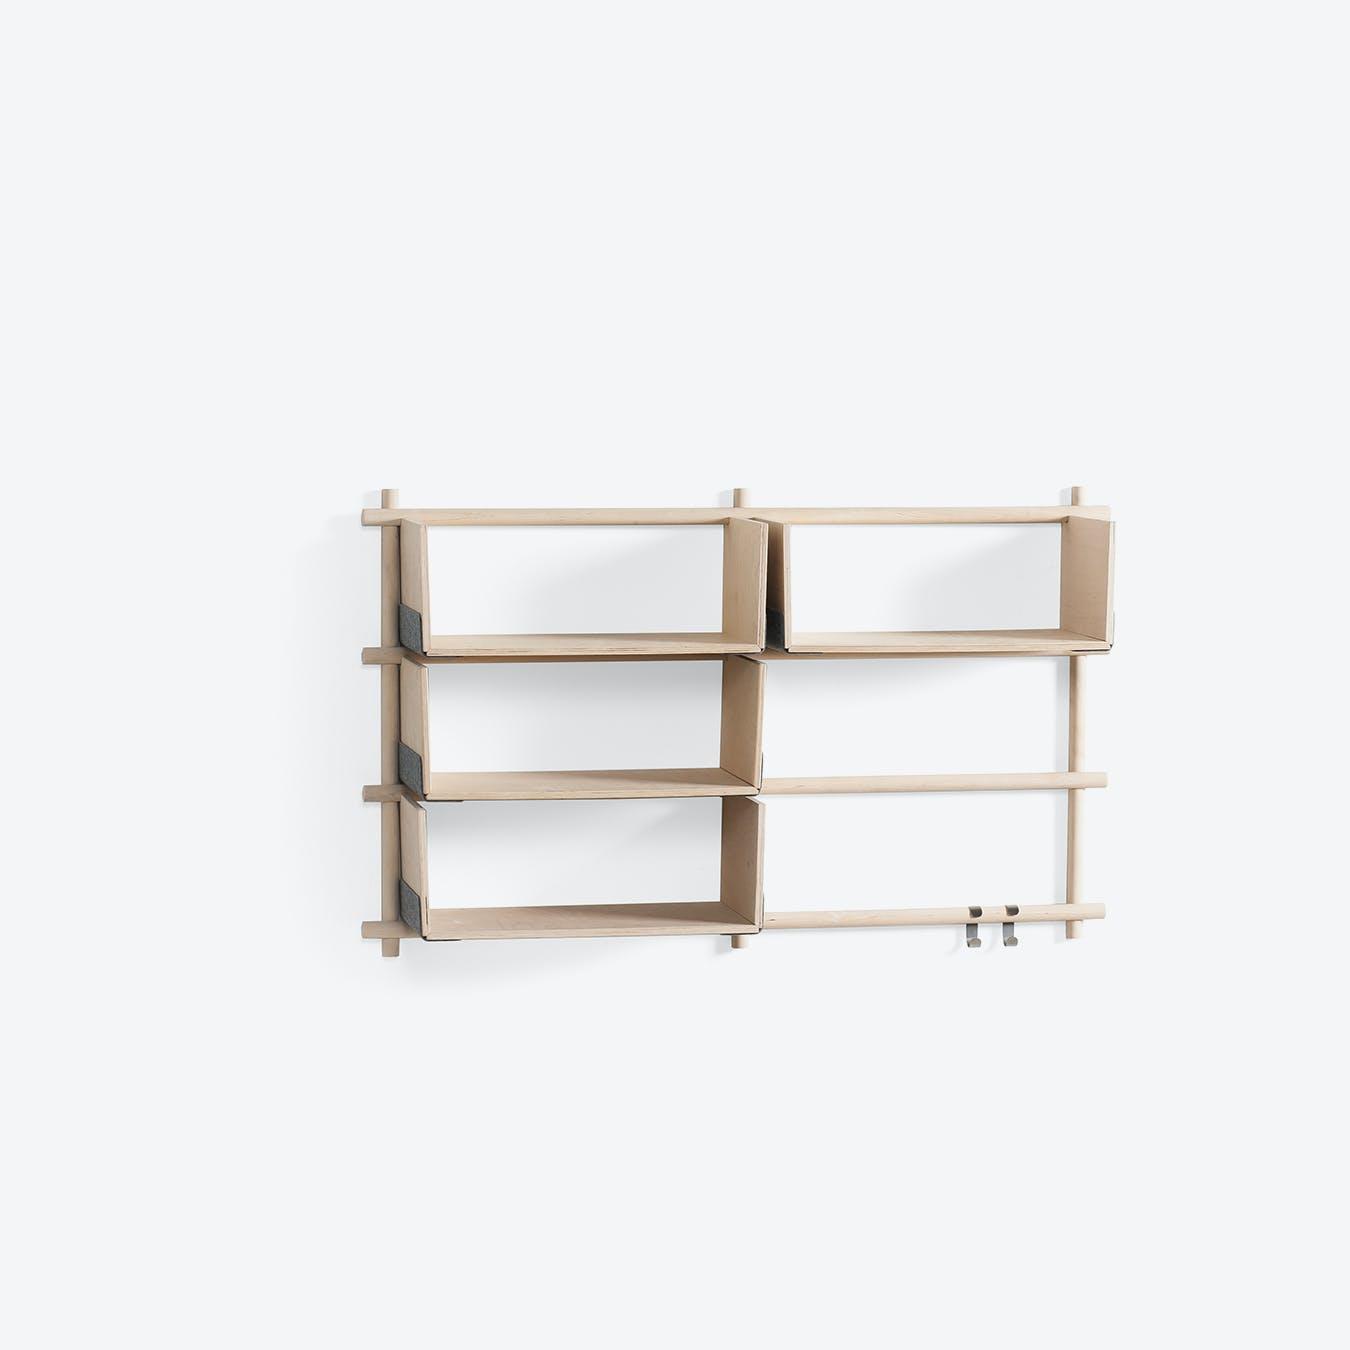 Foldin Shelf - Six Holes, Four Shelves